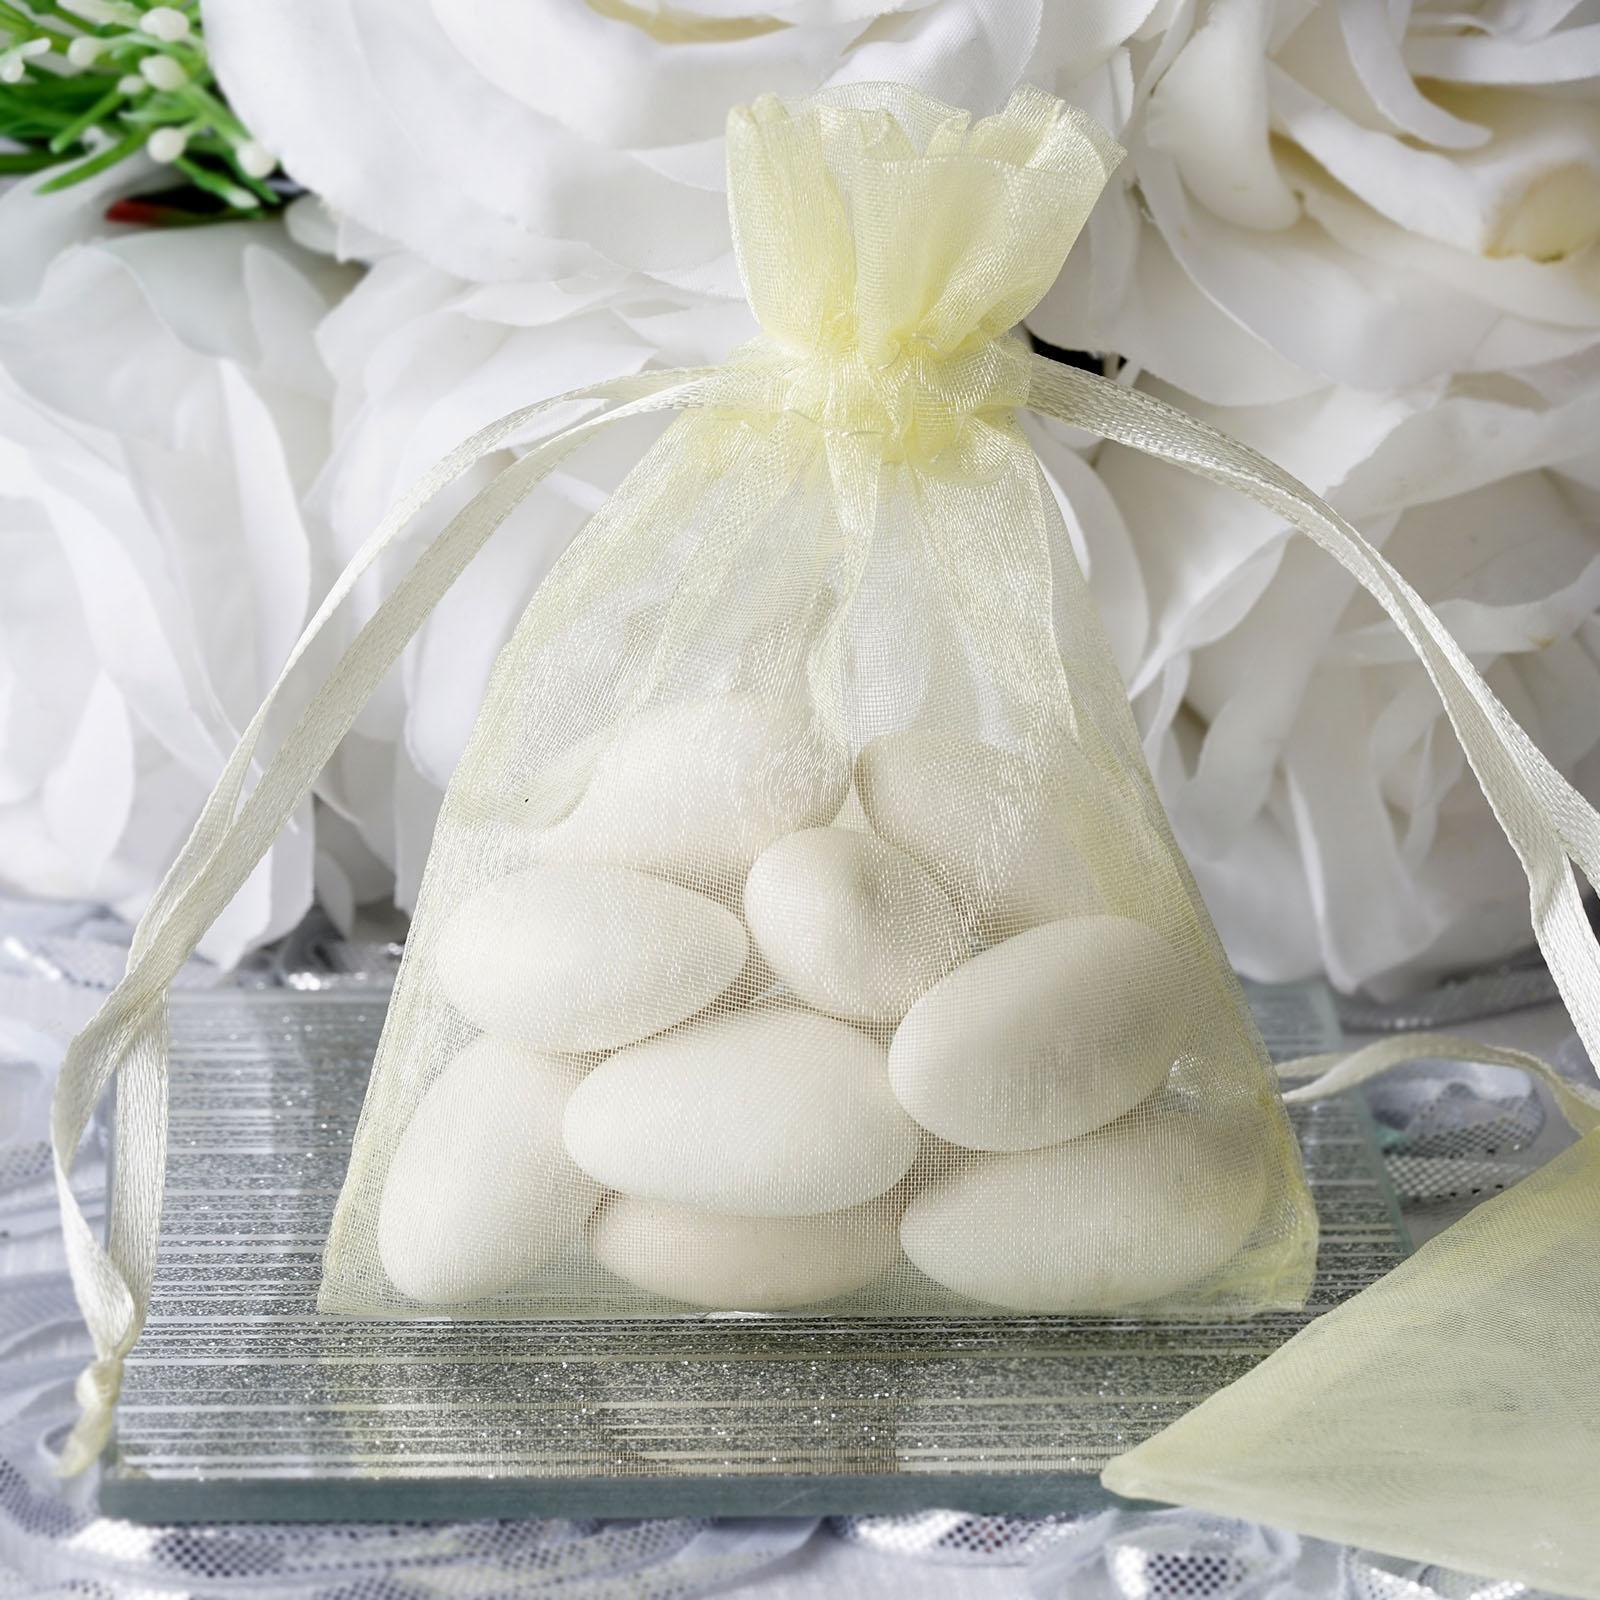 100 pcs 3x4 inch ORGANZA BAGS - Wedding FAVORS Drawstring Gift Pouch ...